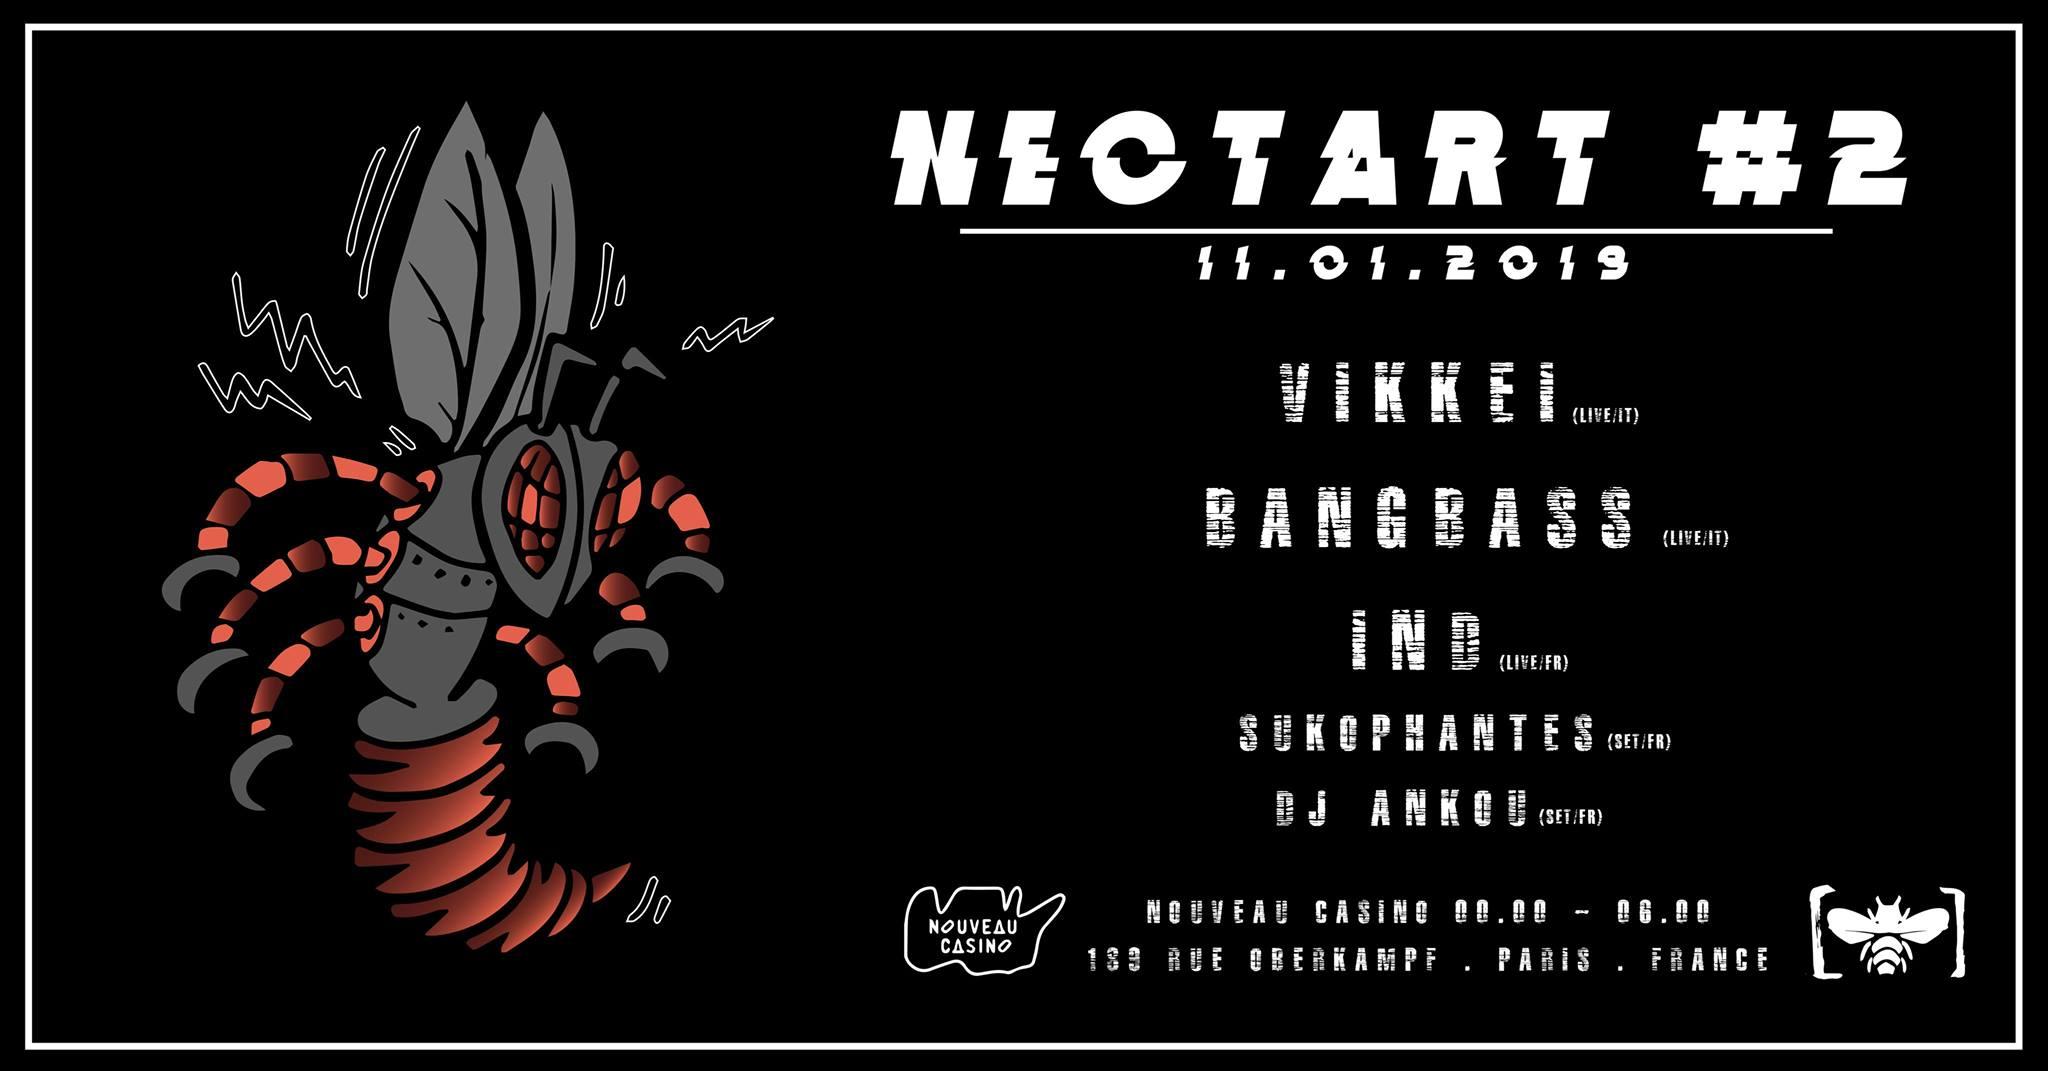 Nectart #2 w/ Vikkei, Bangbass, IND & more